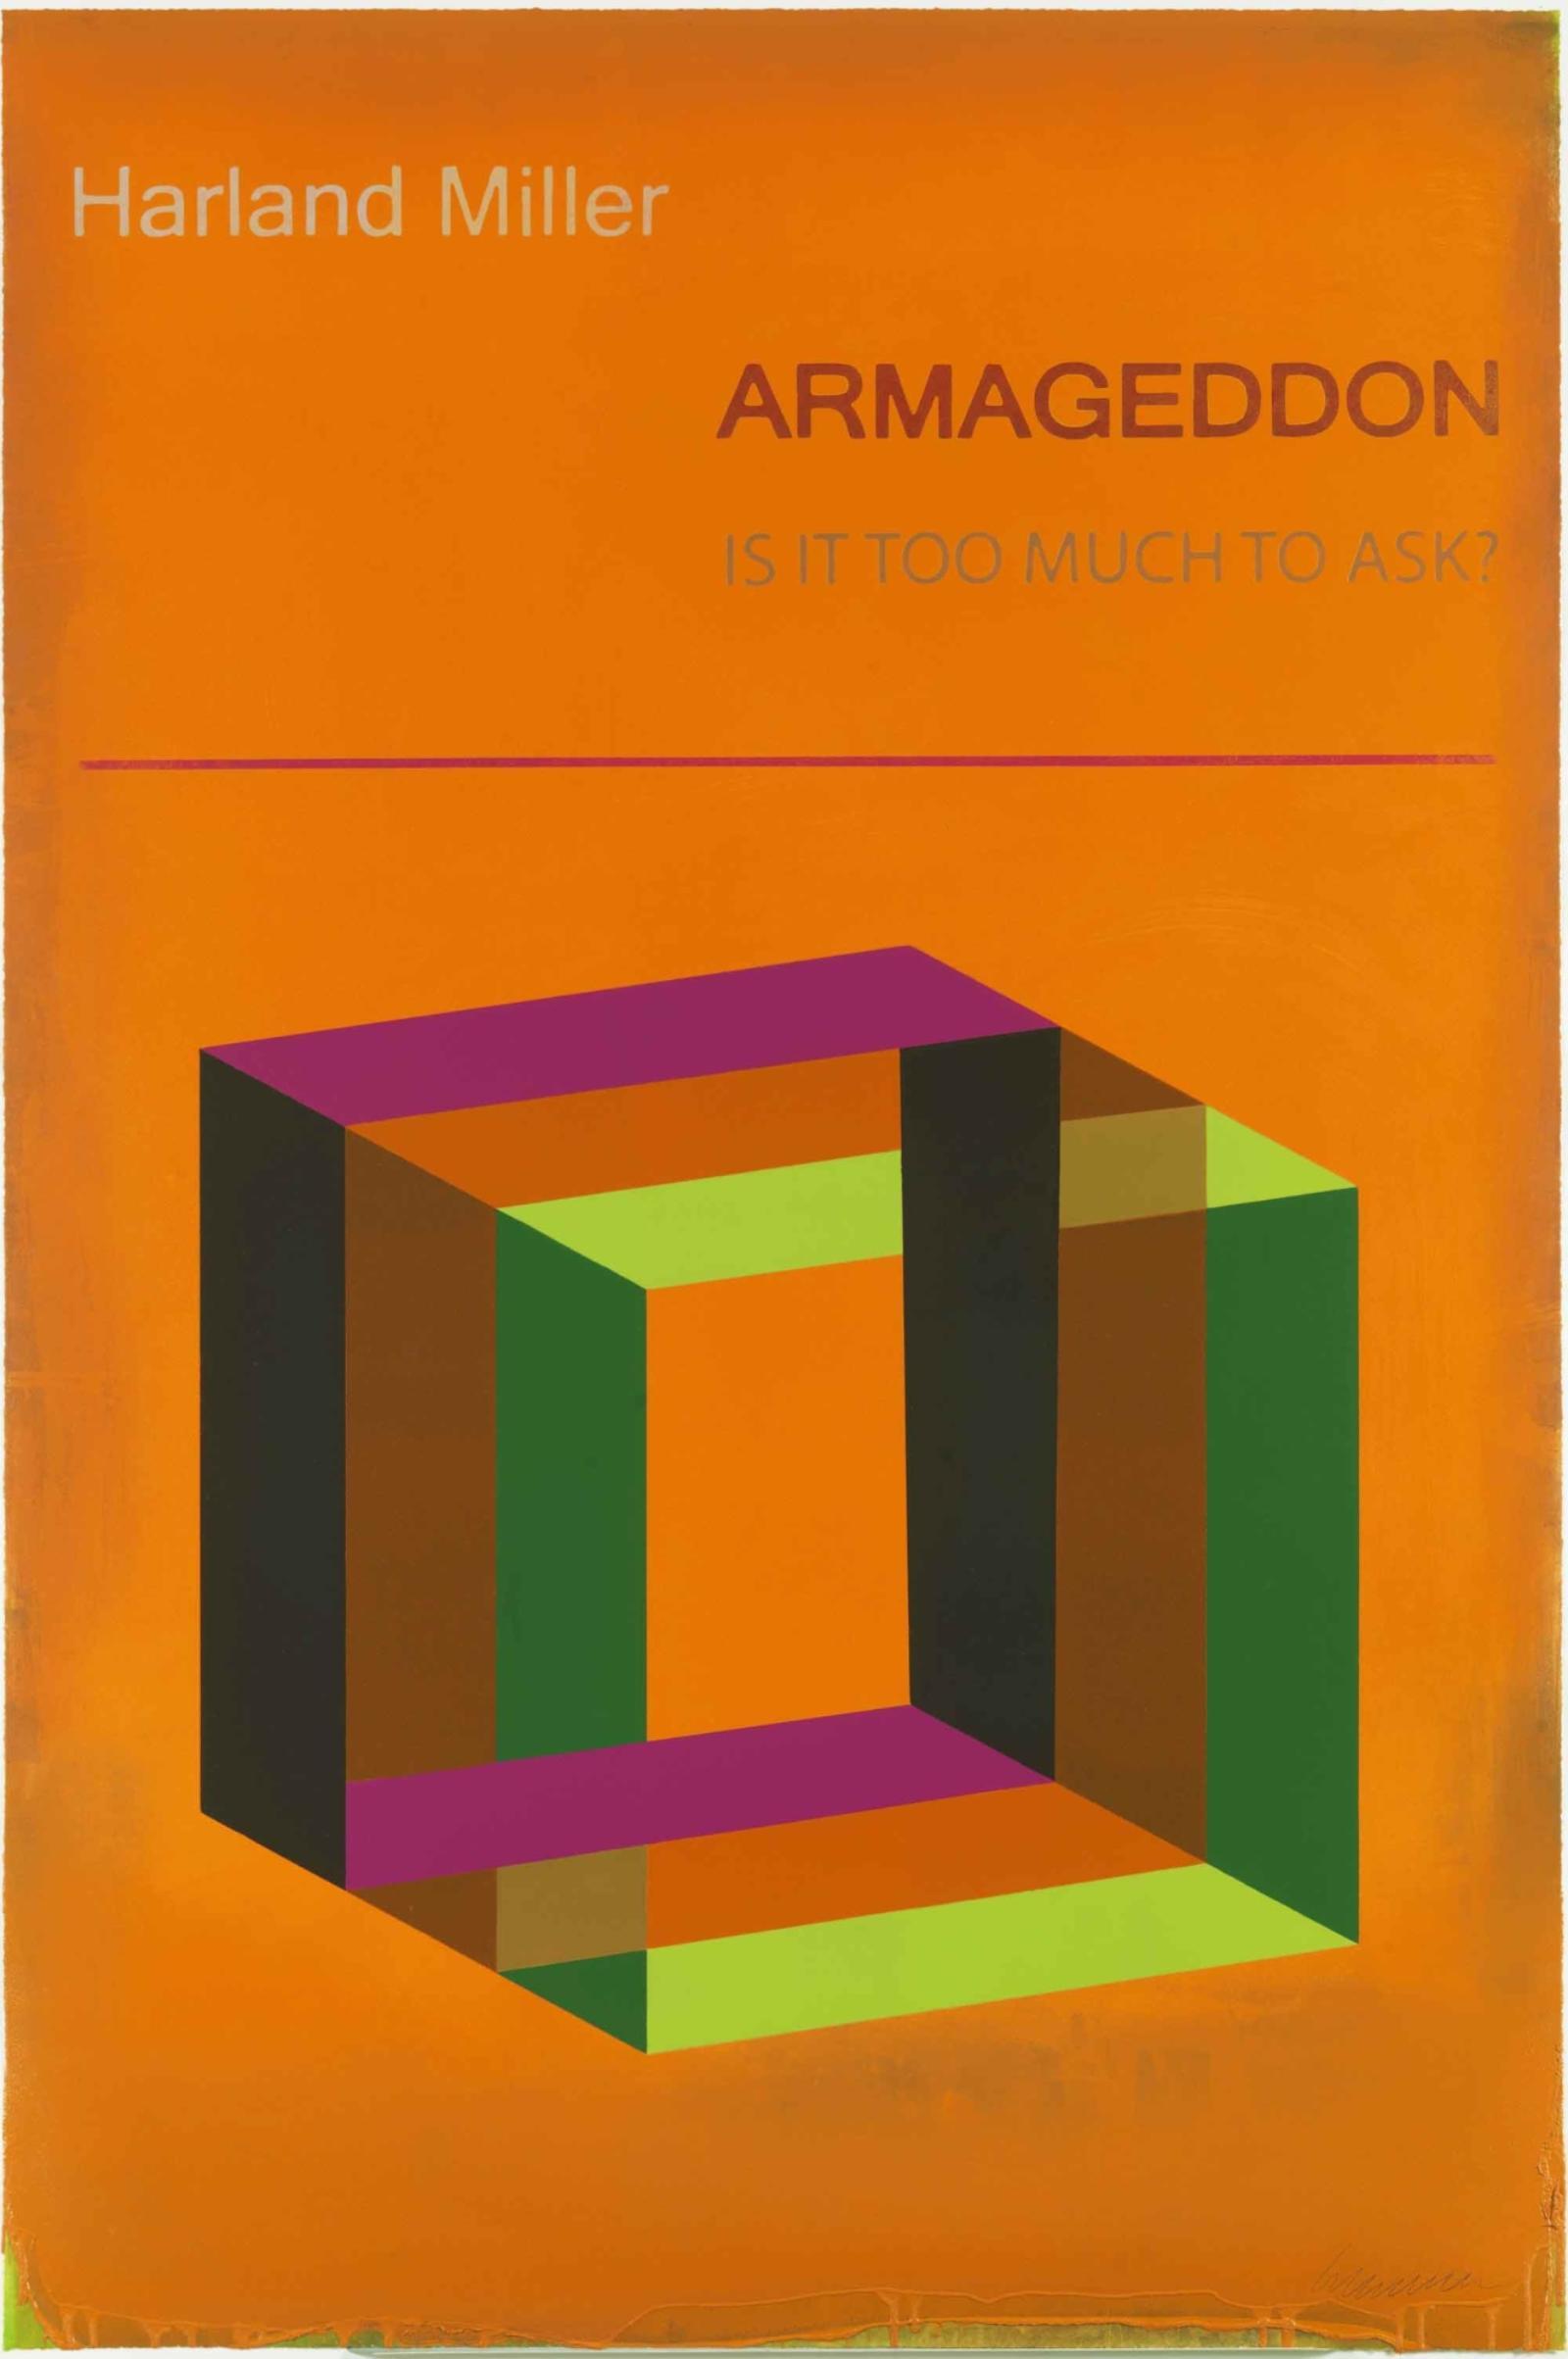 Armageddon - Harland Miller